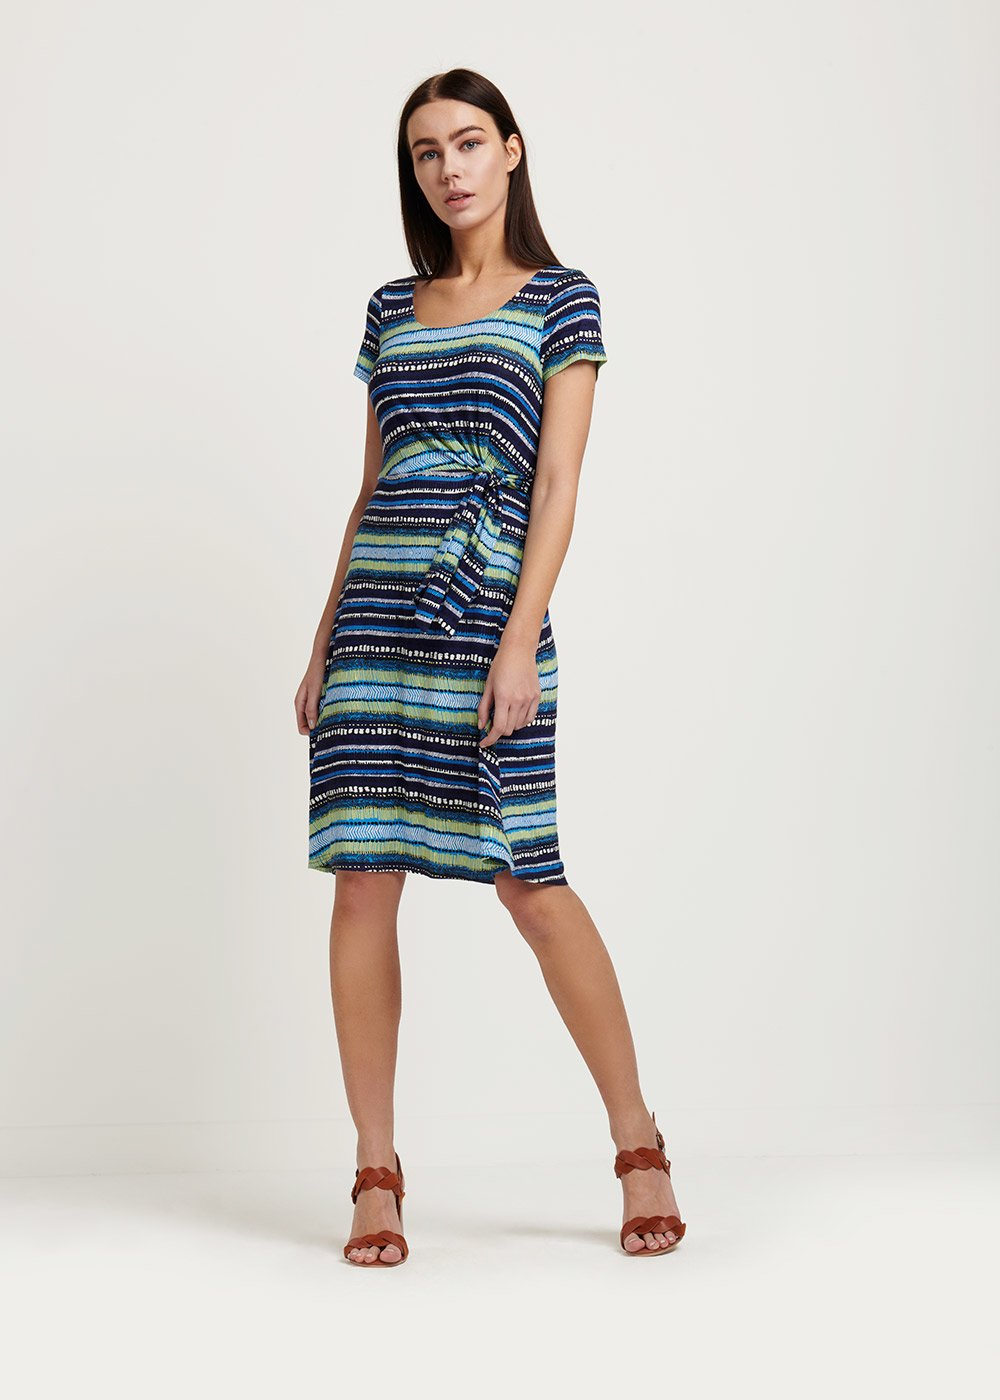 Arios striped dress - M.blue / White / Stripes - Woman